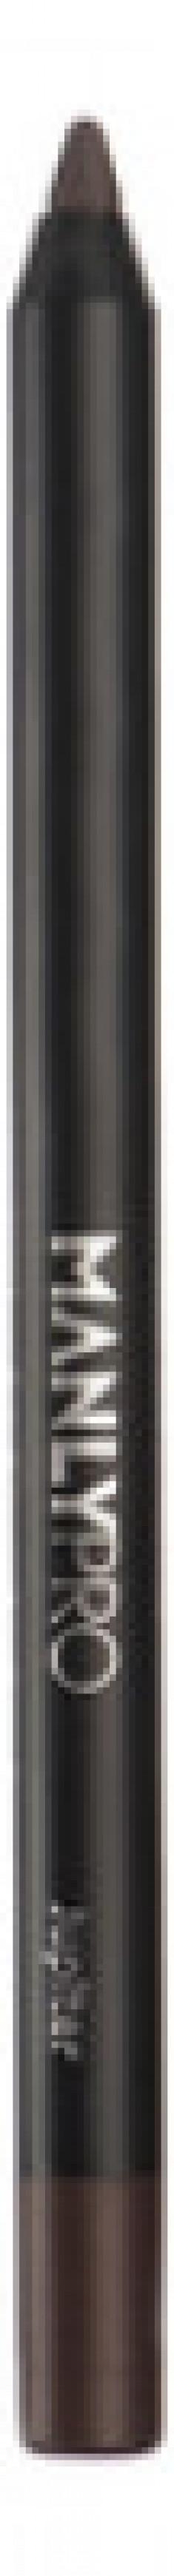 Карандаш для глаз Manly PRO JUPITER E104